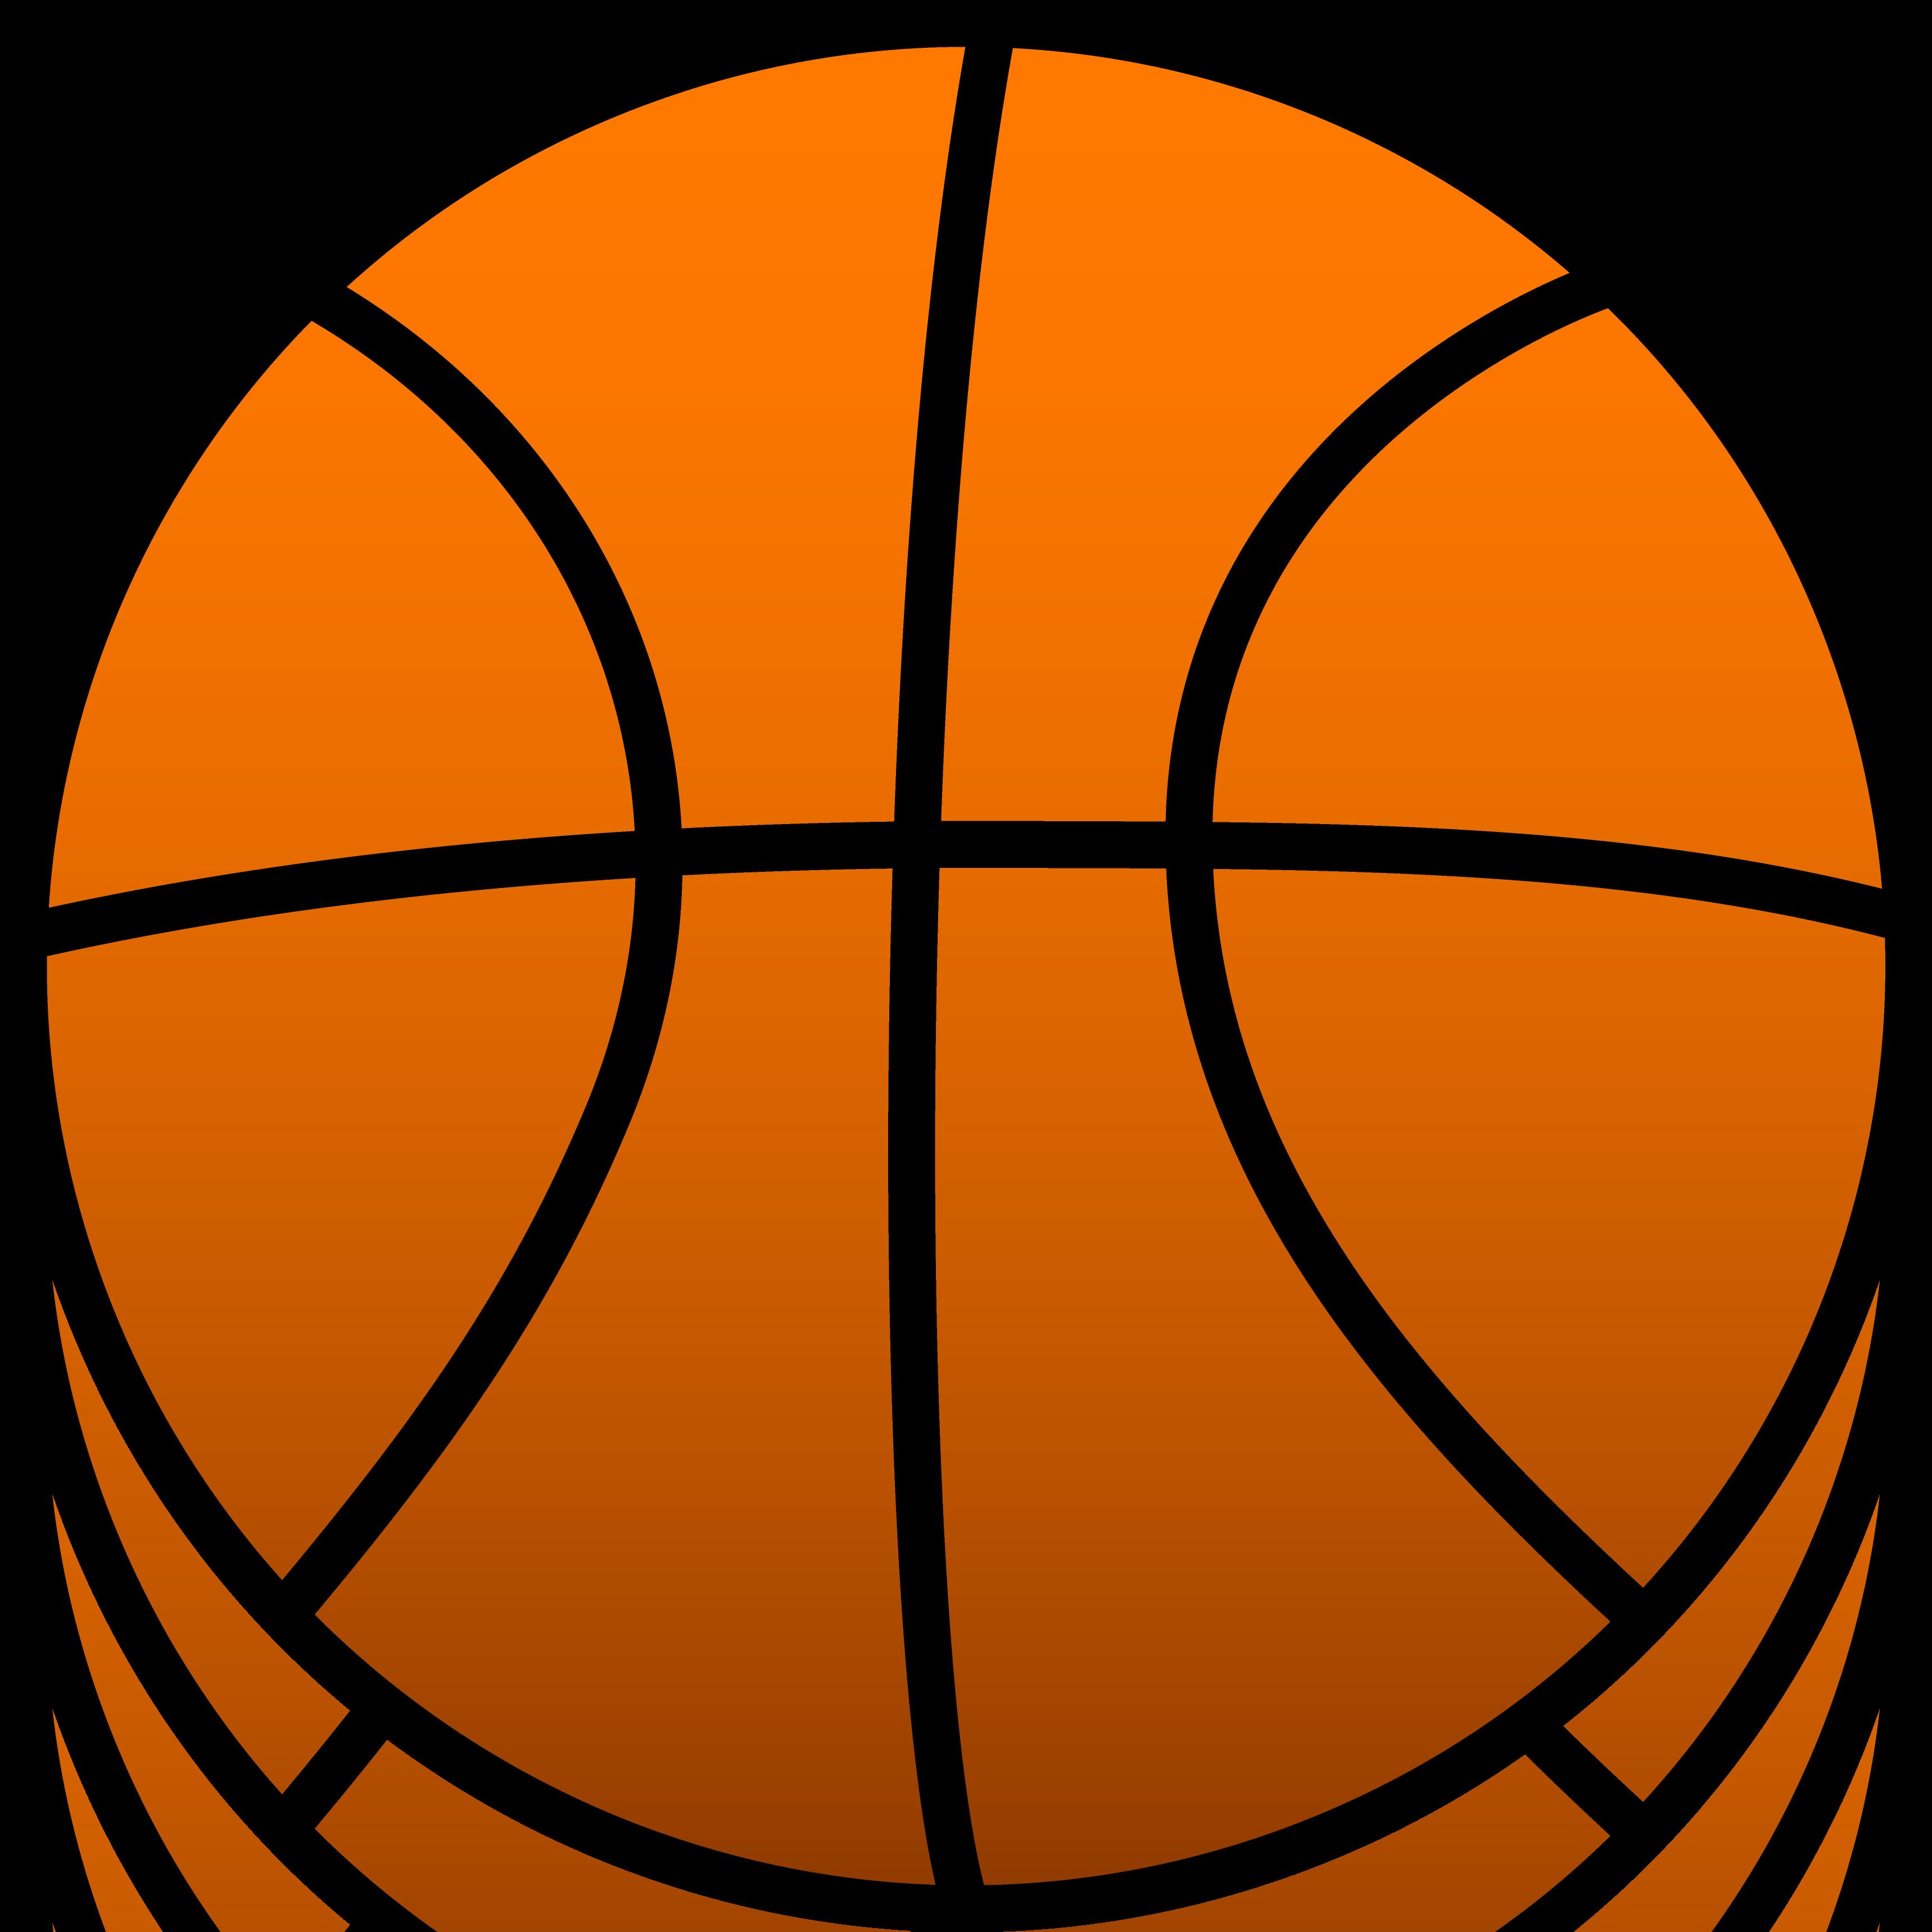 Basketball Clipart.